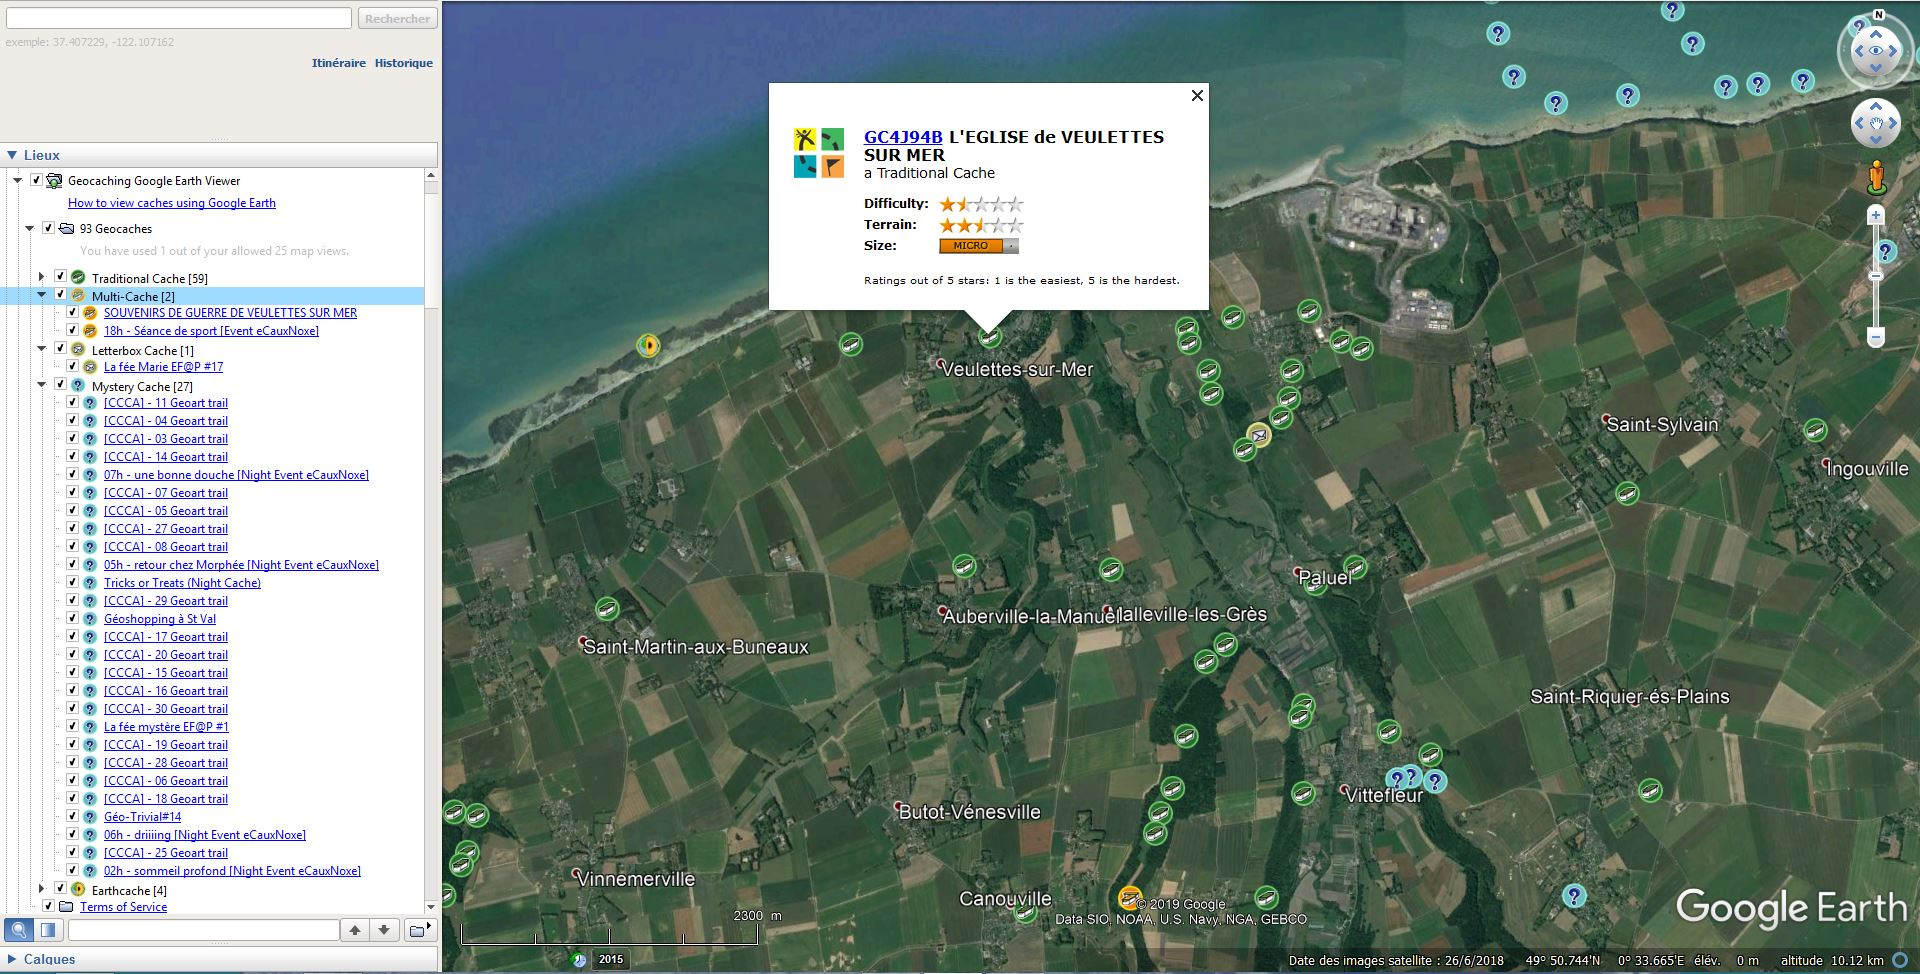 [KML] Geocaching Google Earth Viewer Tsge_965